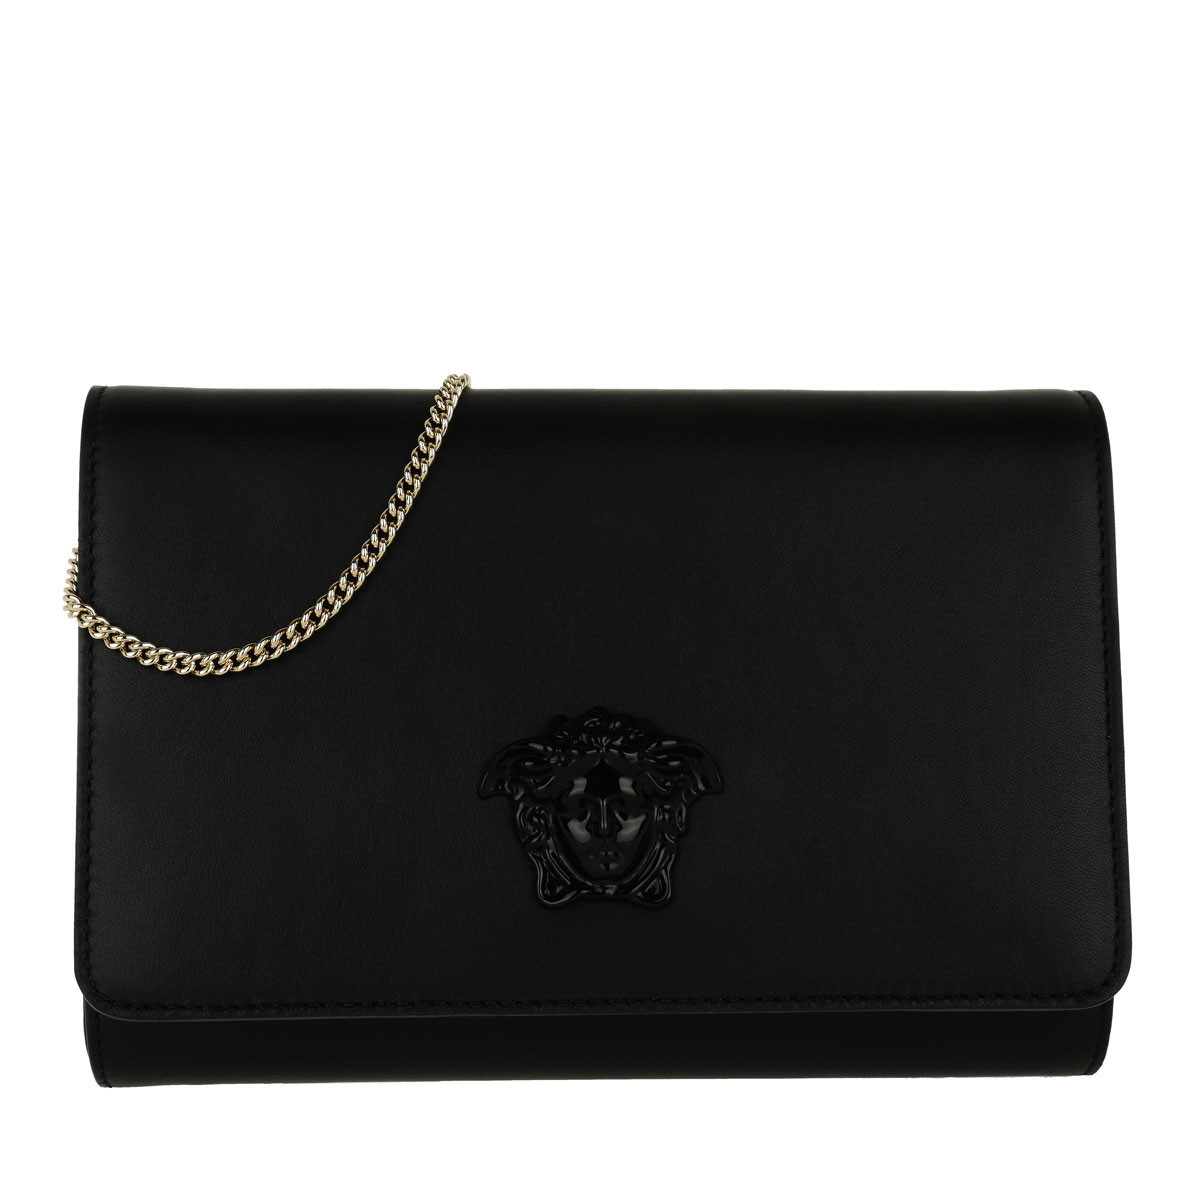 Versace Clutch - Leather Crossbody Bag Nero/Oro Chiaro - in schwarz - für Damen